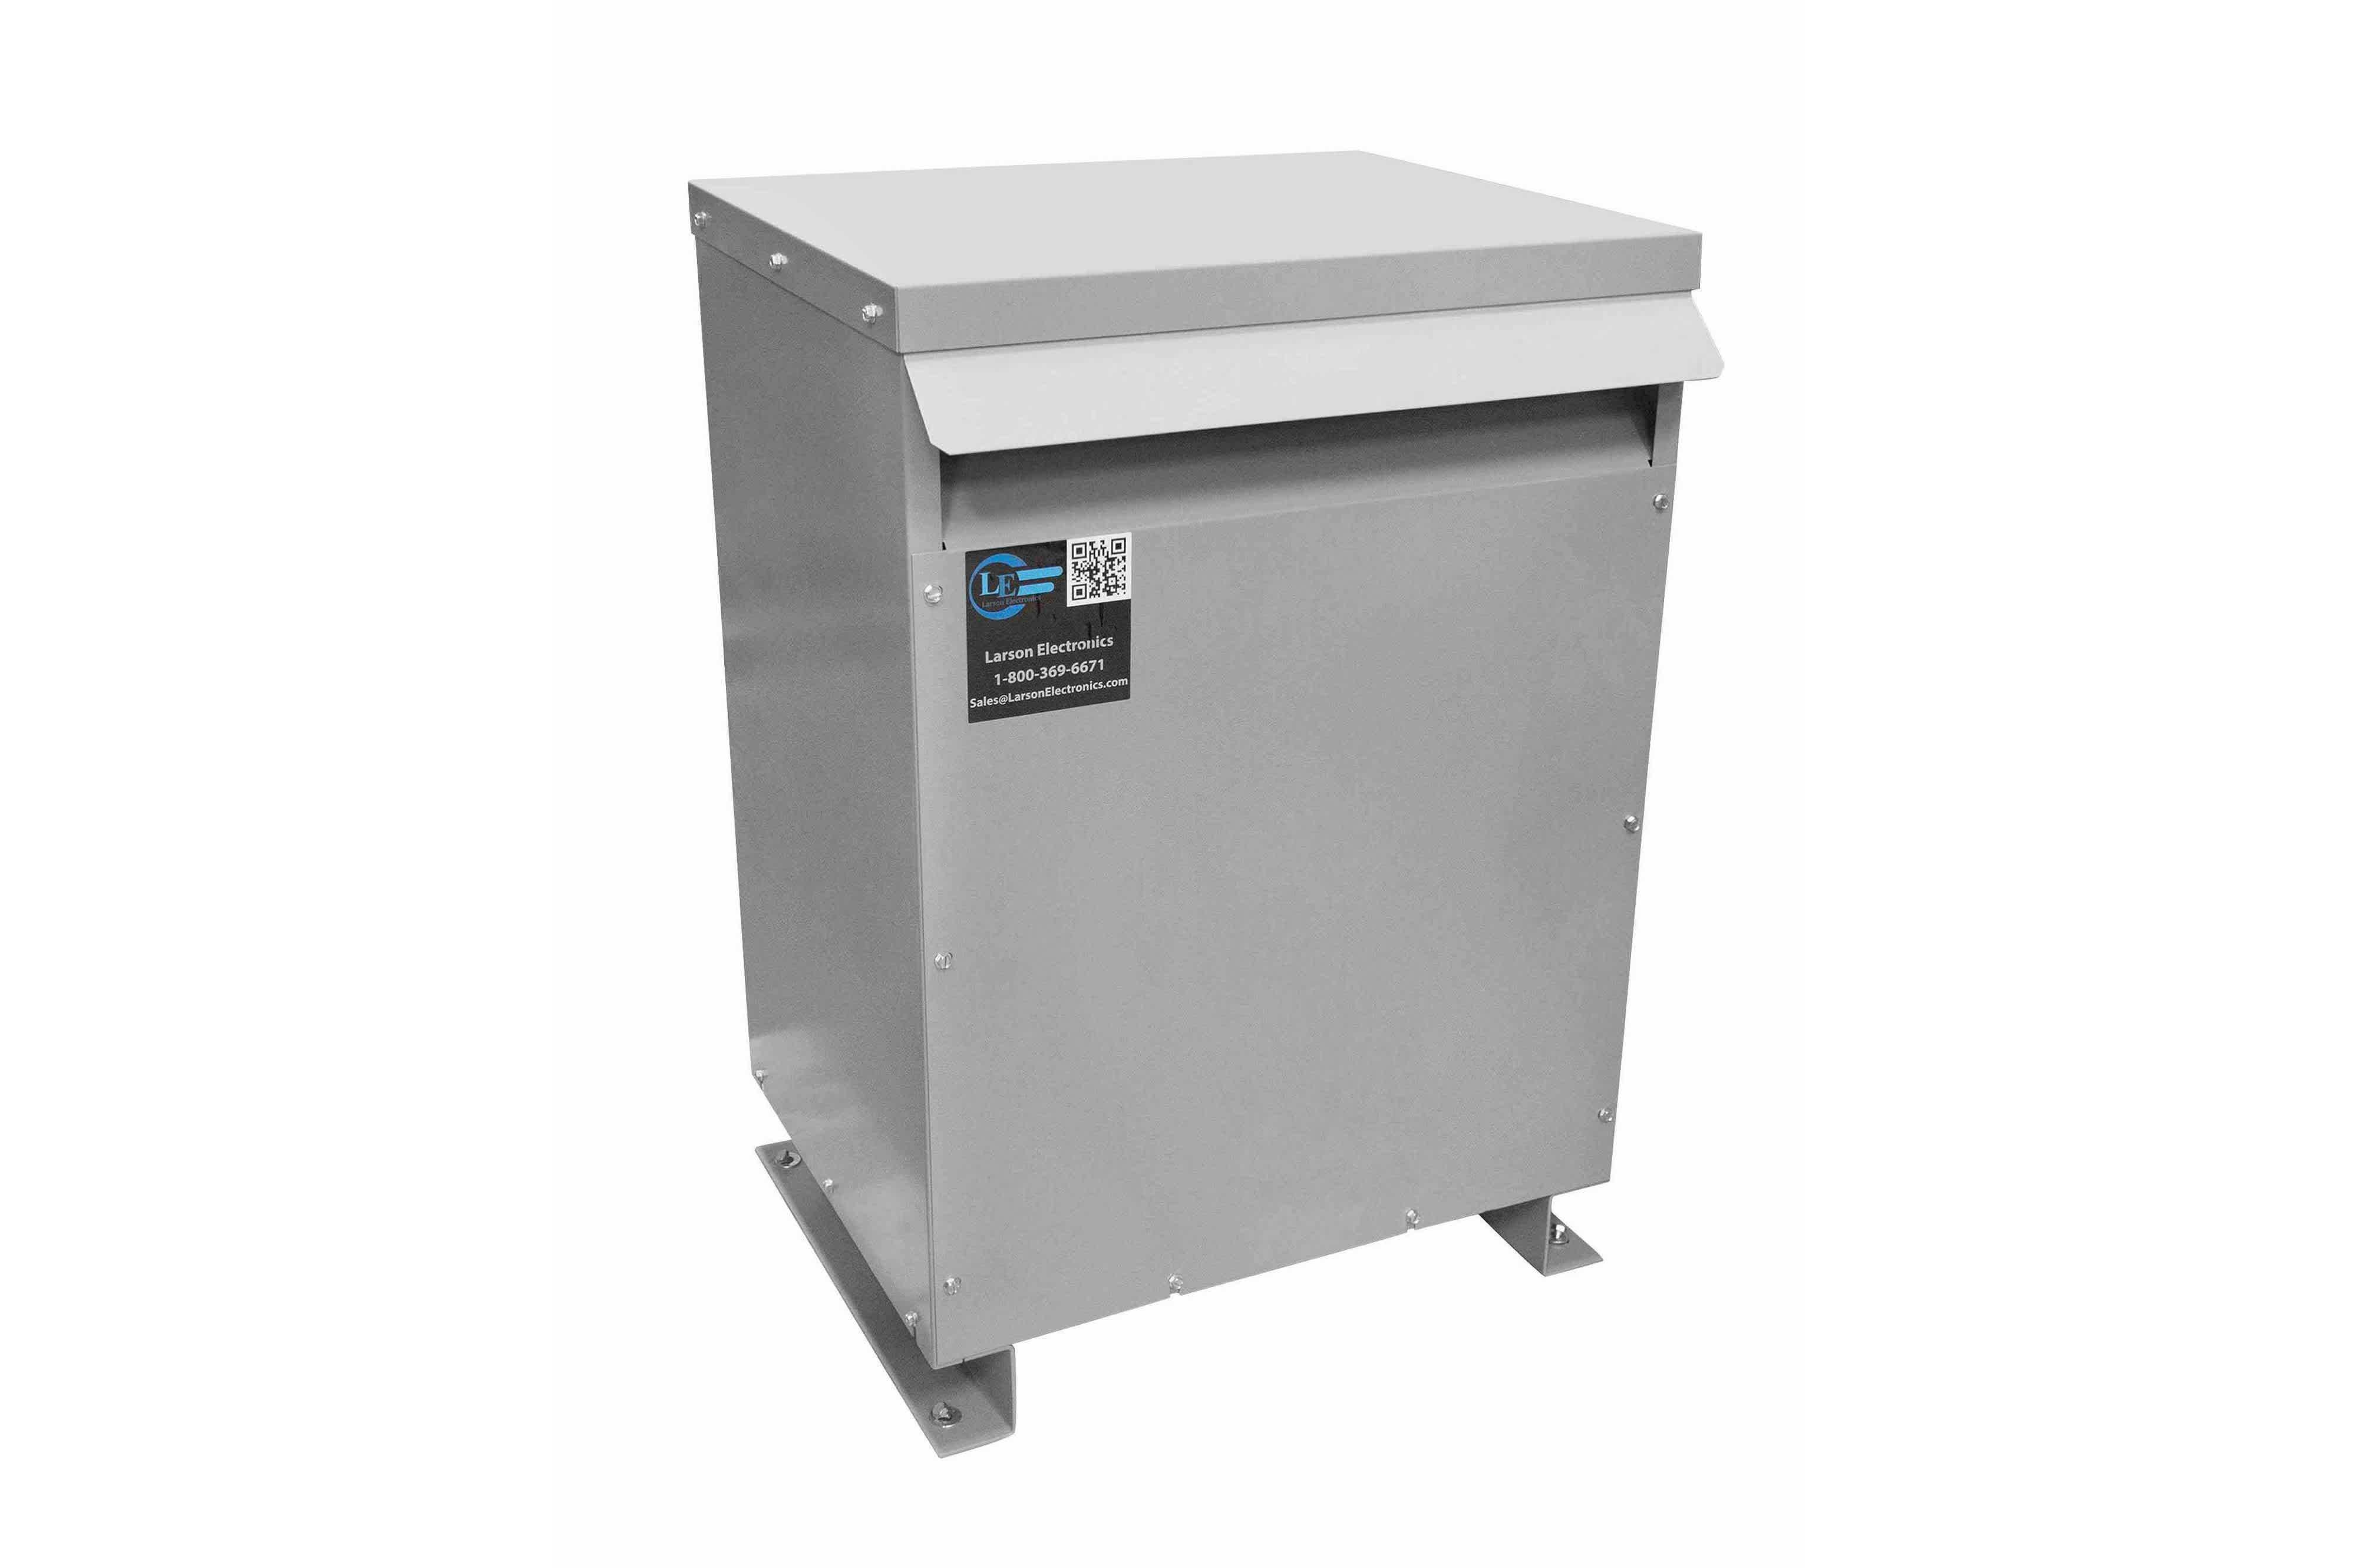 150 kVA 3PH Isolation Transformer, 208V Wye Primary, 415Y/240 Wye-N Secondary, N3R, Ventilated, 60 Hz